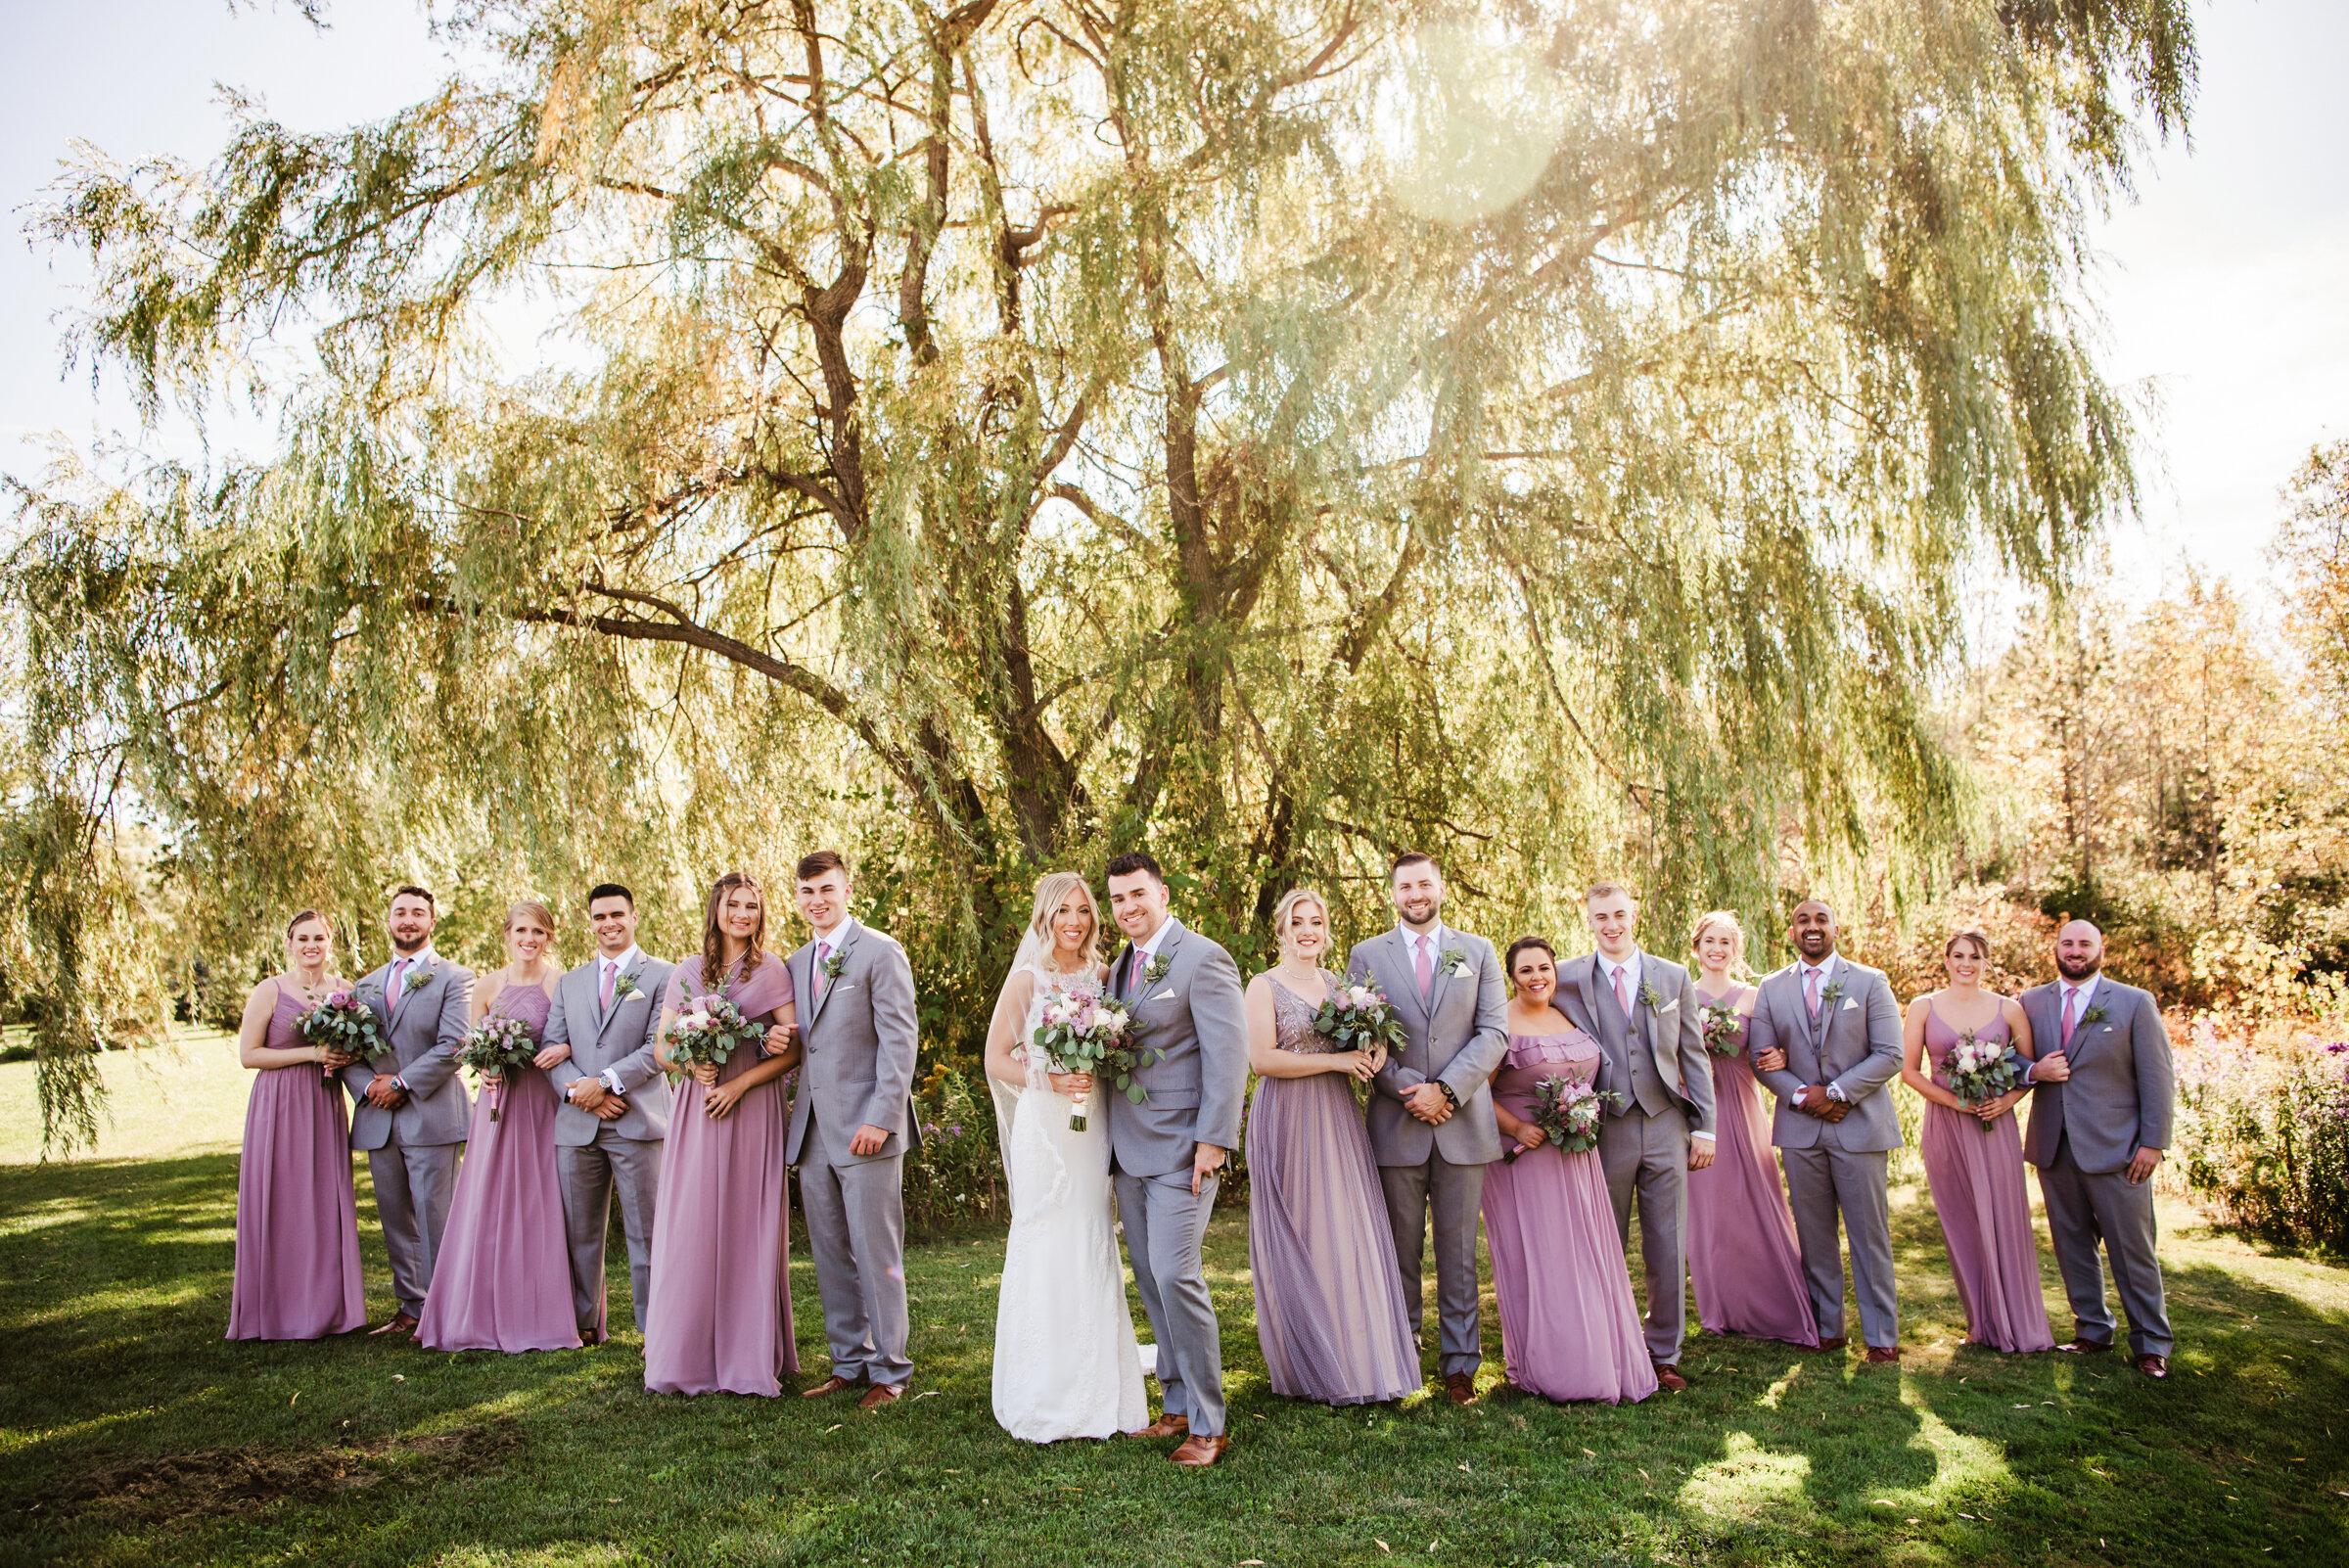 Deerfield_Country_Club_Rochester_Wedding_JILL_STUDIO_Rochester_NY_Photographer_DSC_6303.jpg